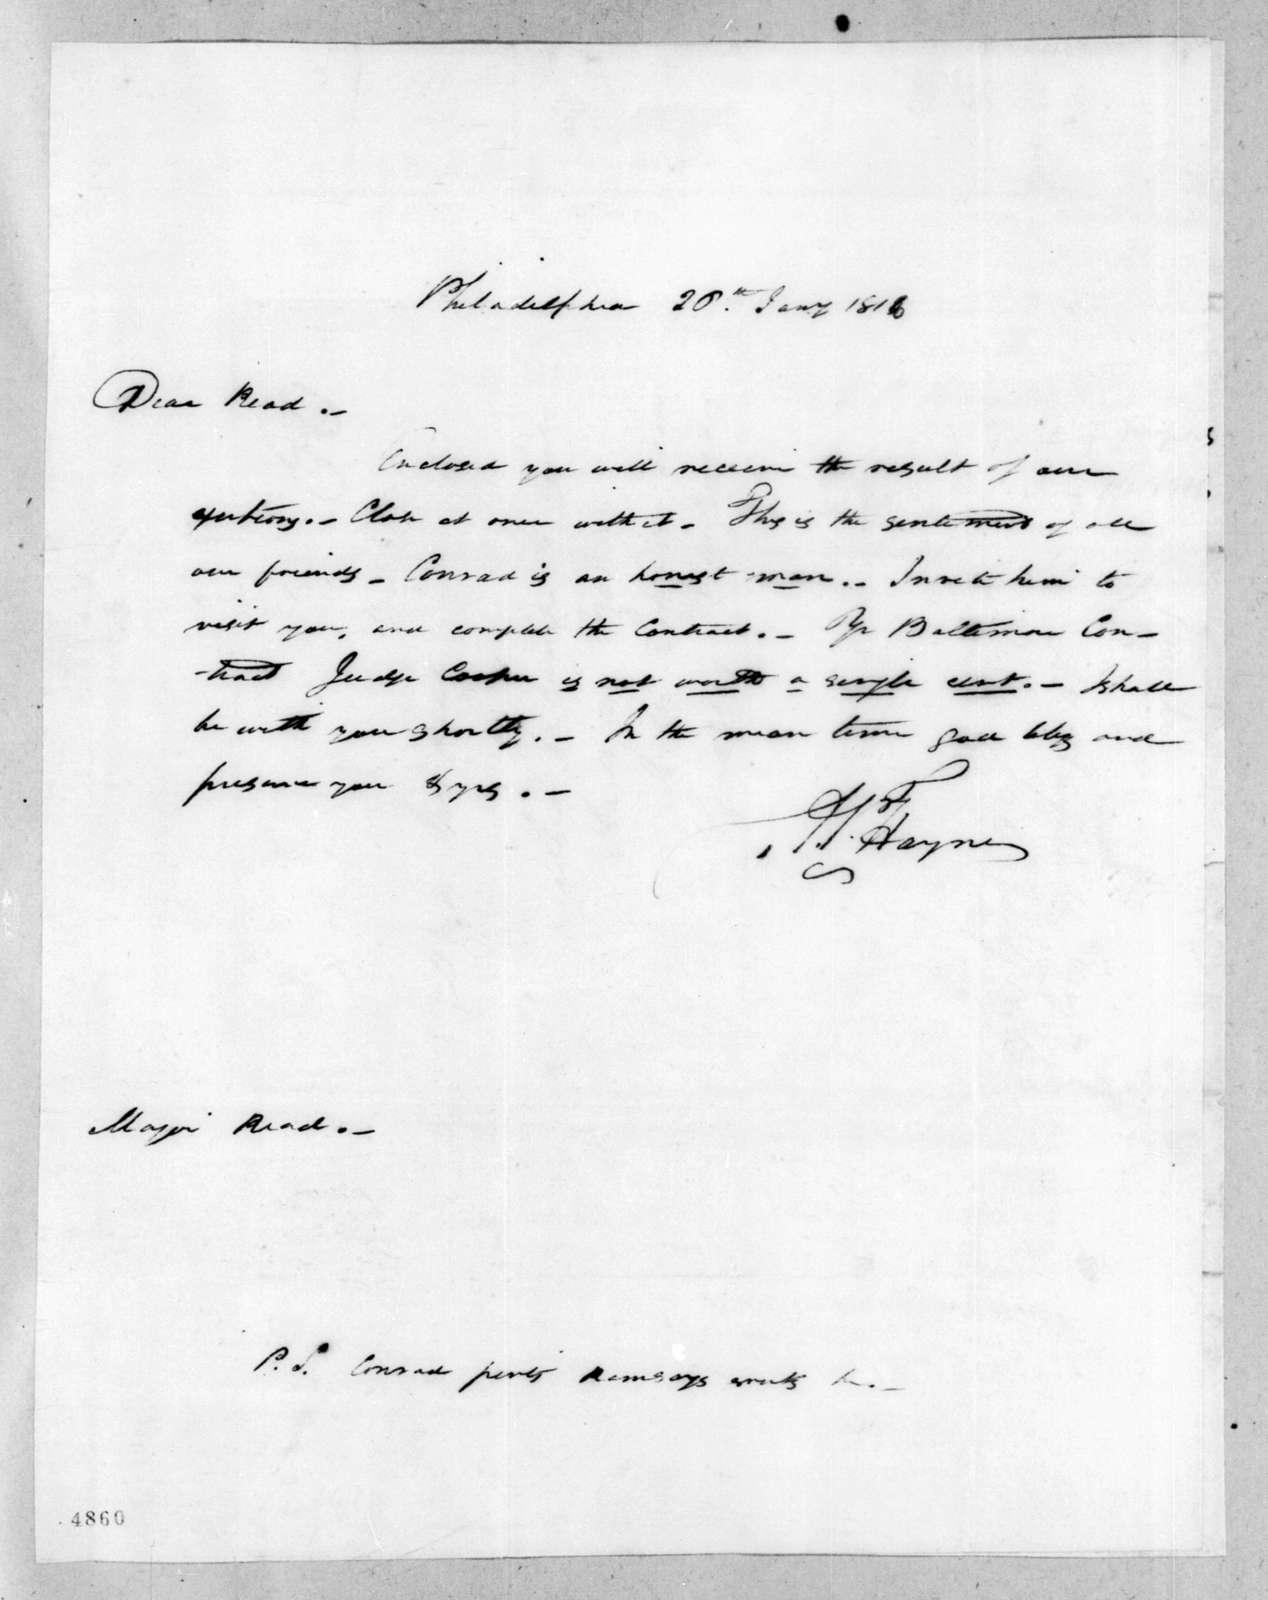 Arthur Peronneau Hayne to John Reid, January 26, 1816